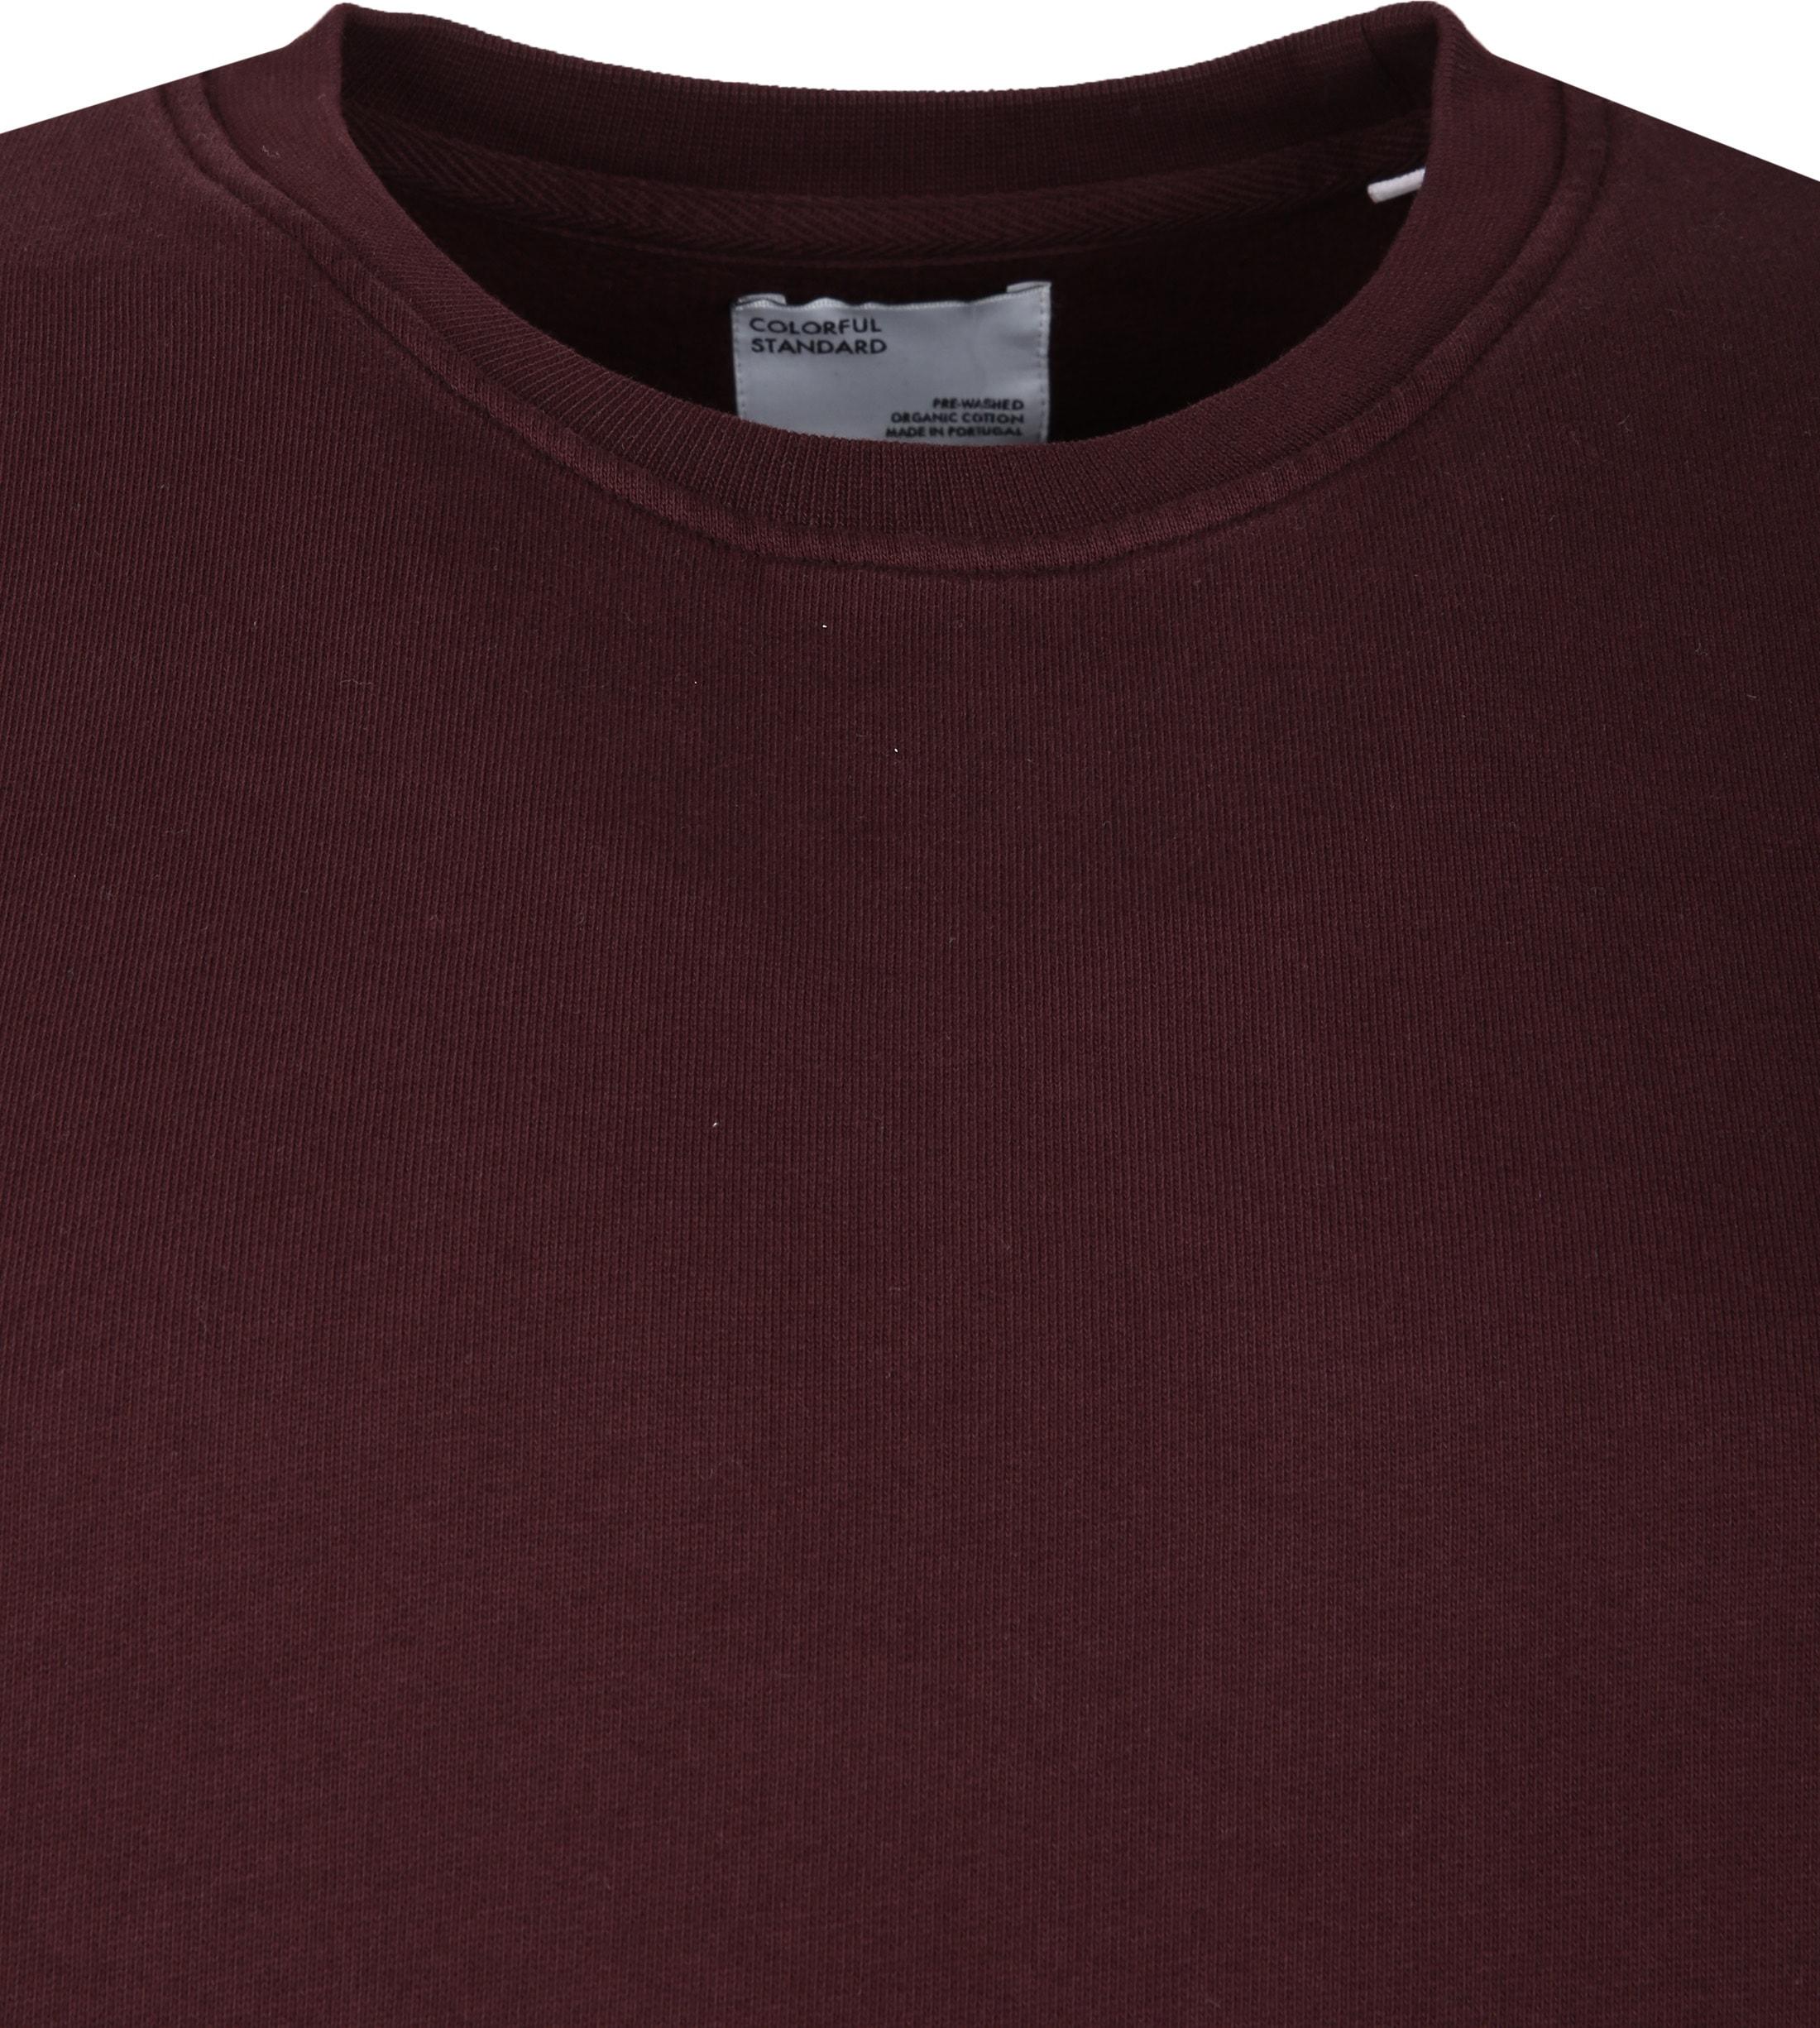 Colorful Standard Sweater Organic Bordeaux foto 1